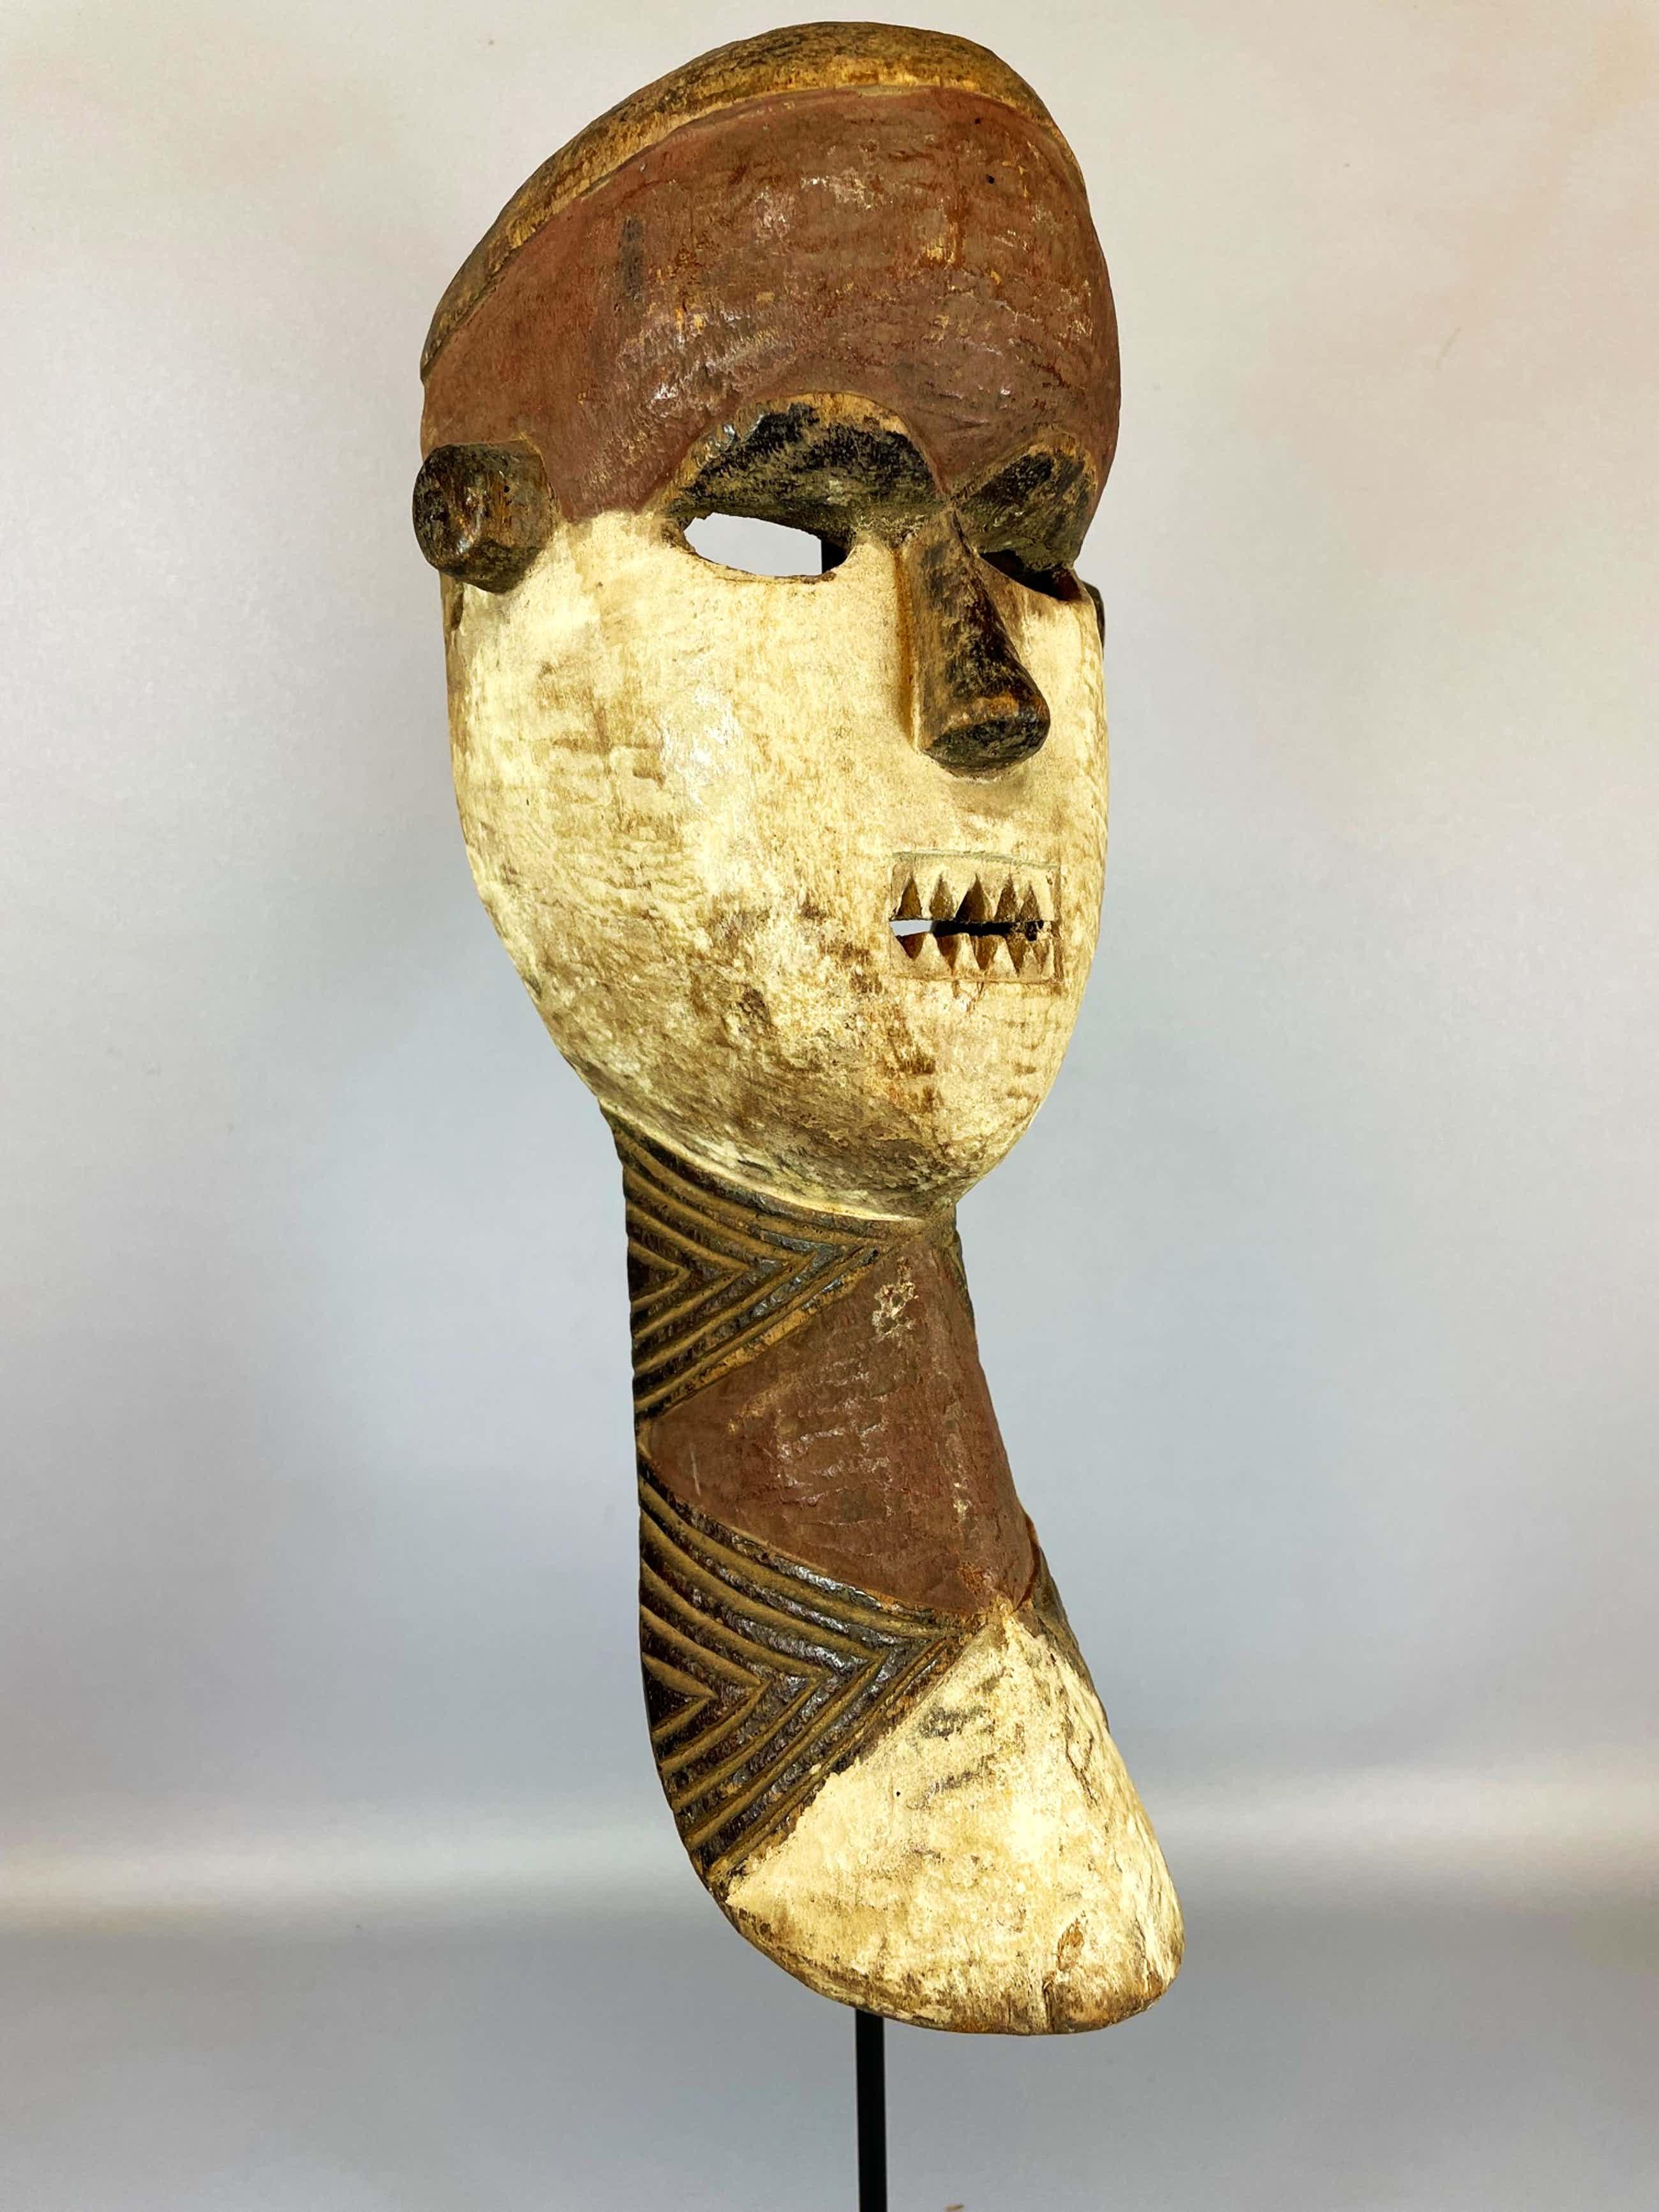 Pende - African mask from the Pende - Congo kopen? Bied vanaf 35!